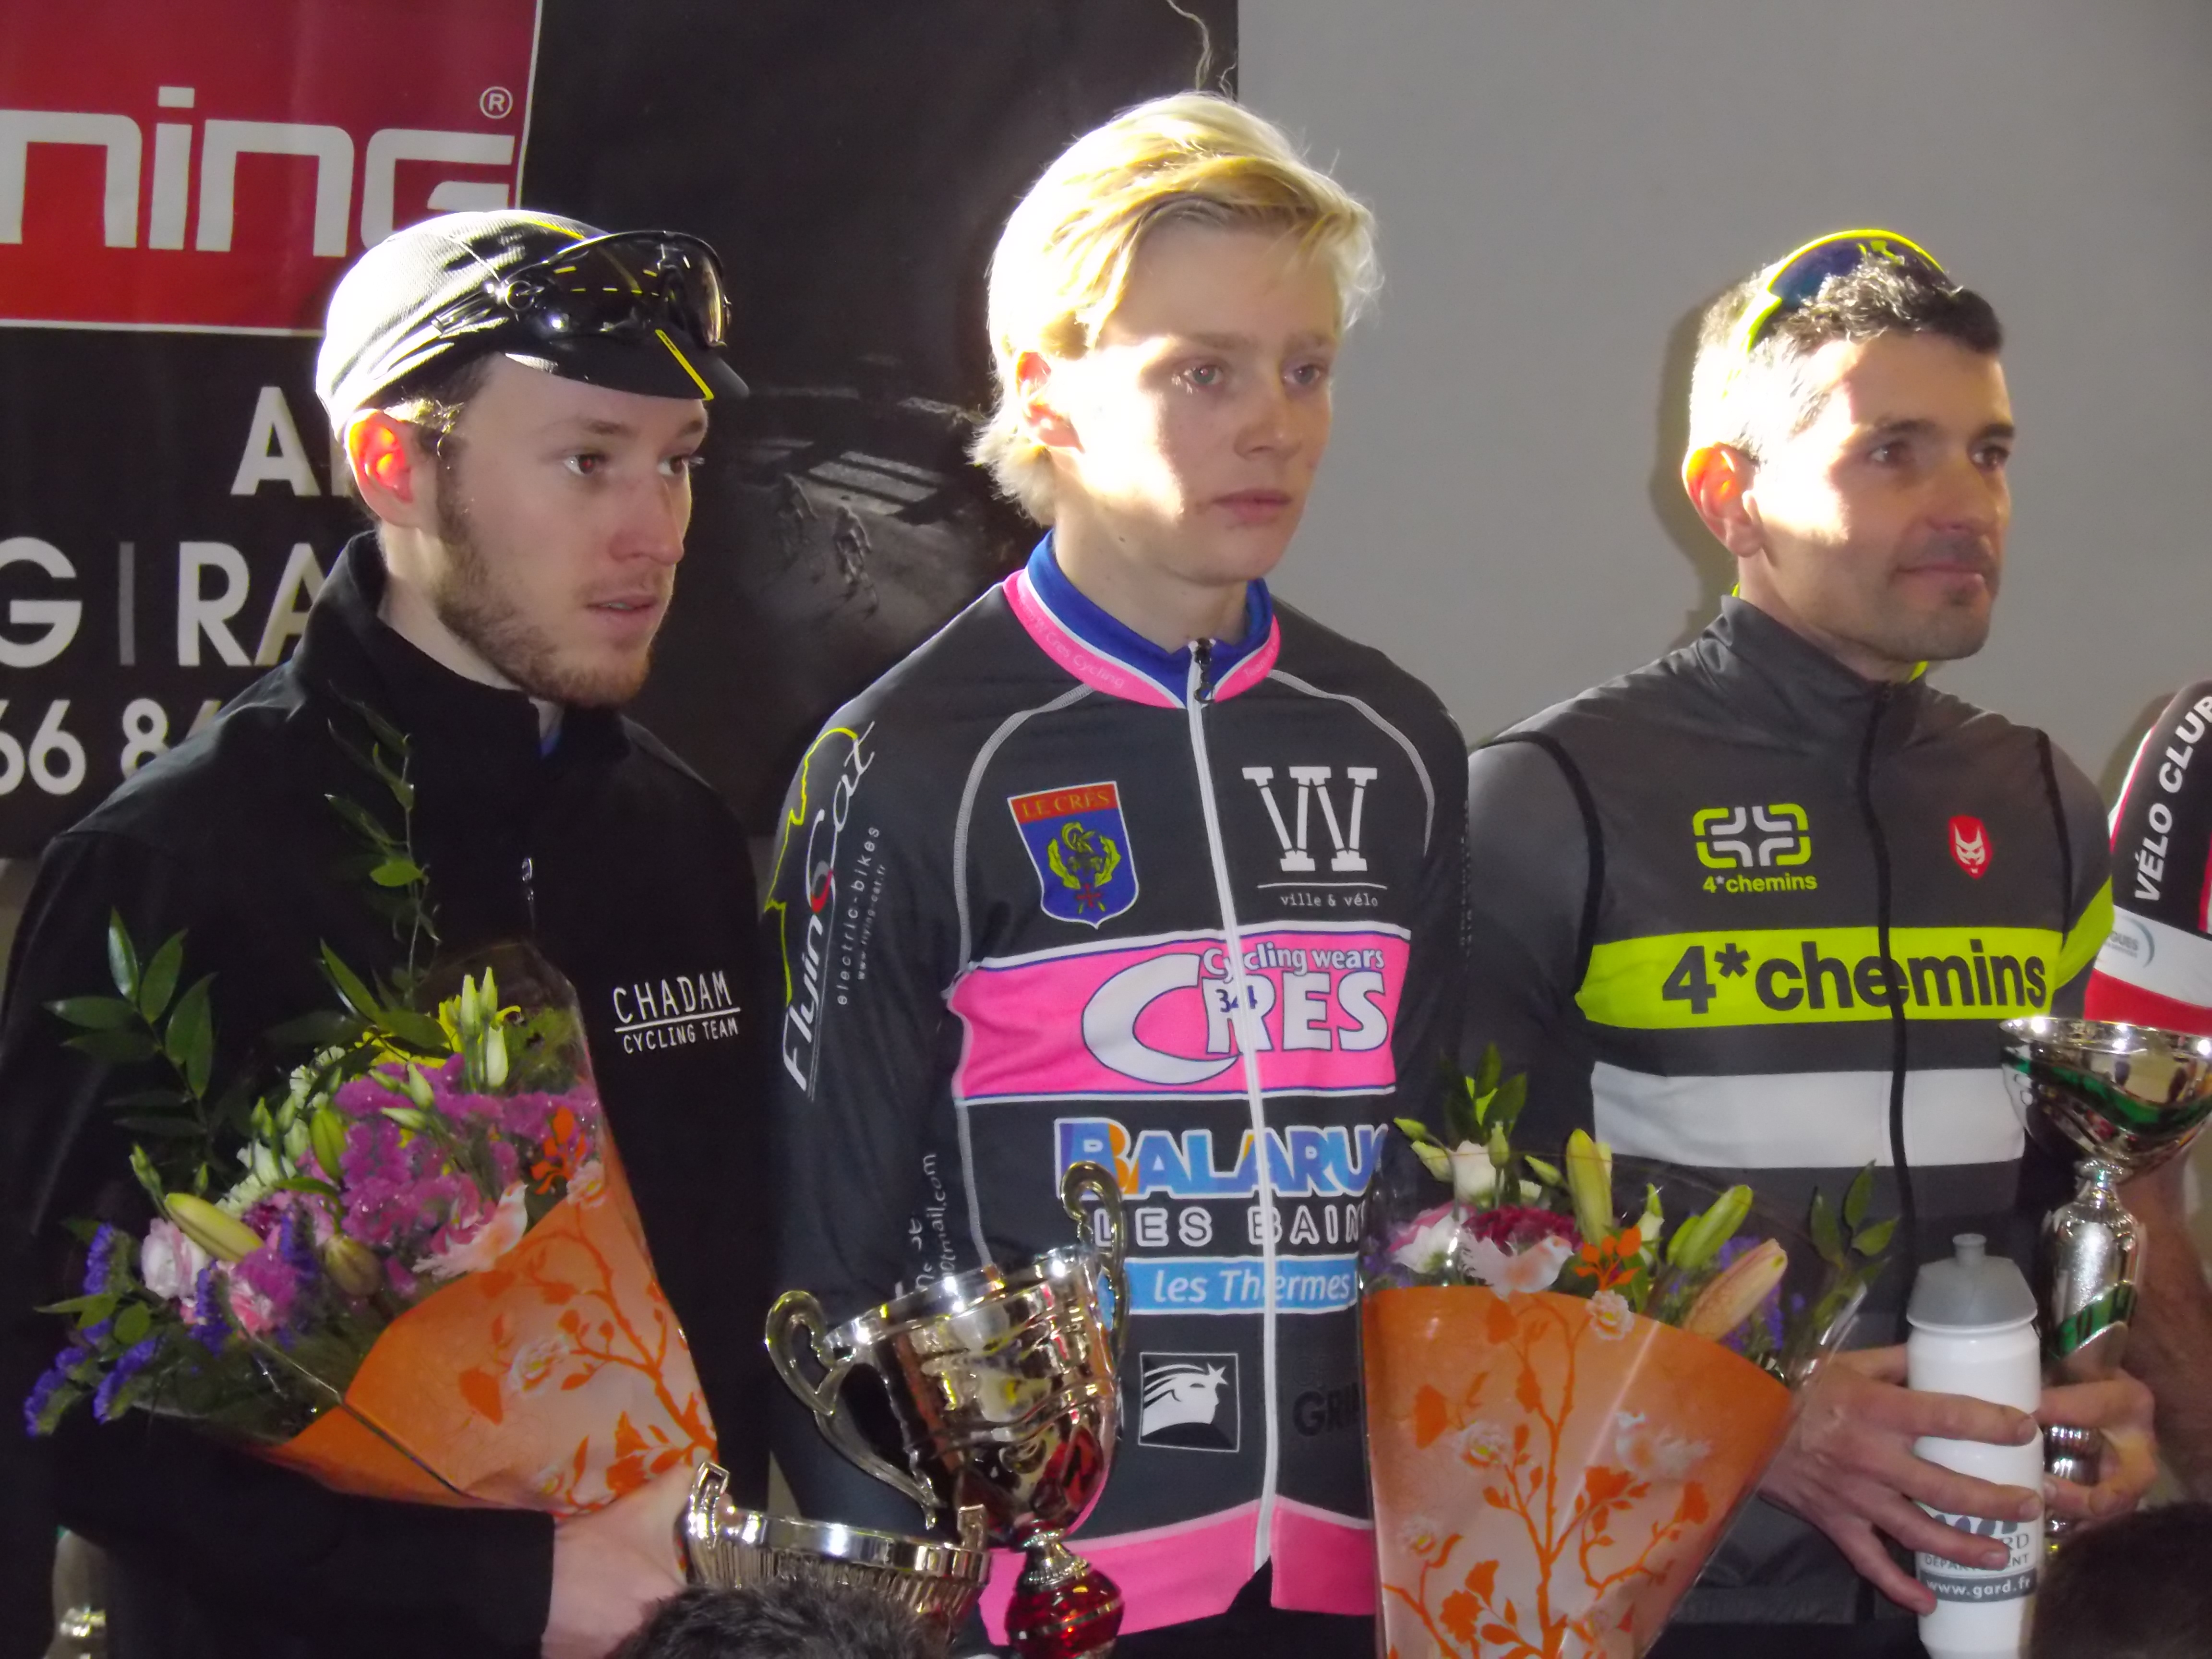 podium scratch à Ste Méjanne lès Alès